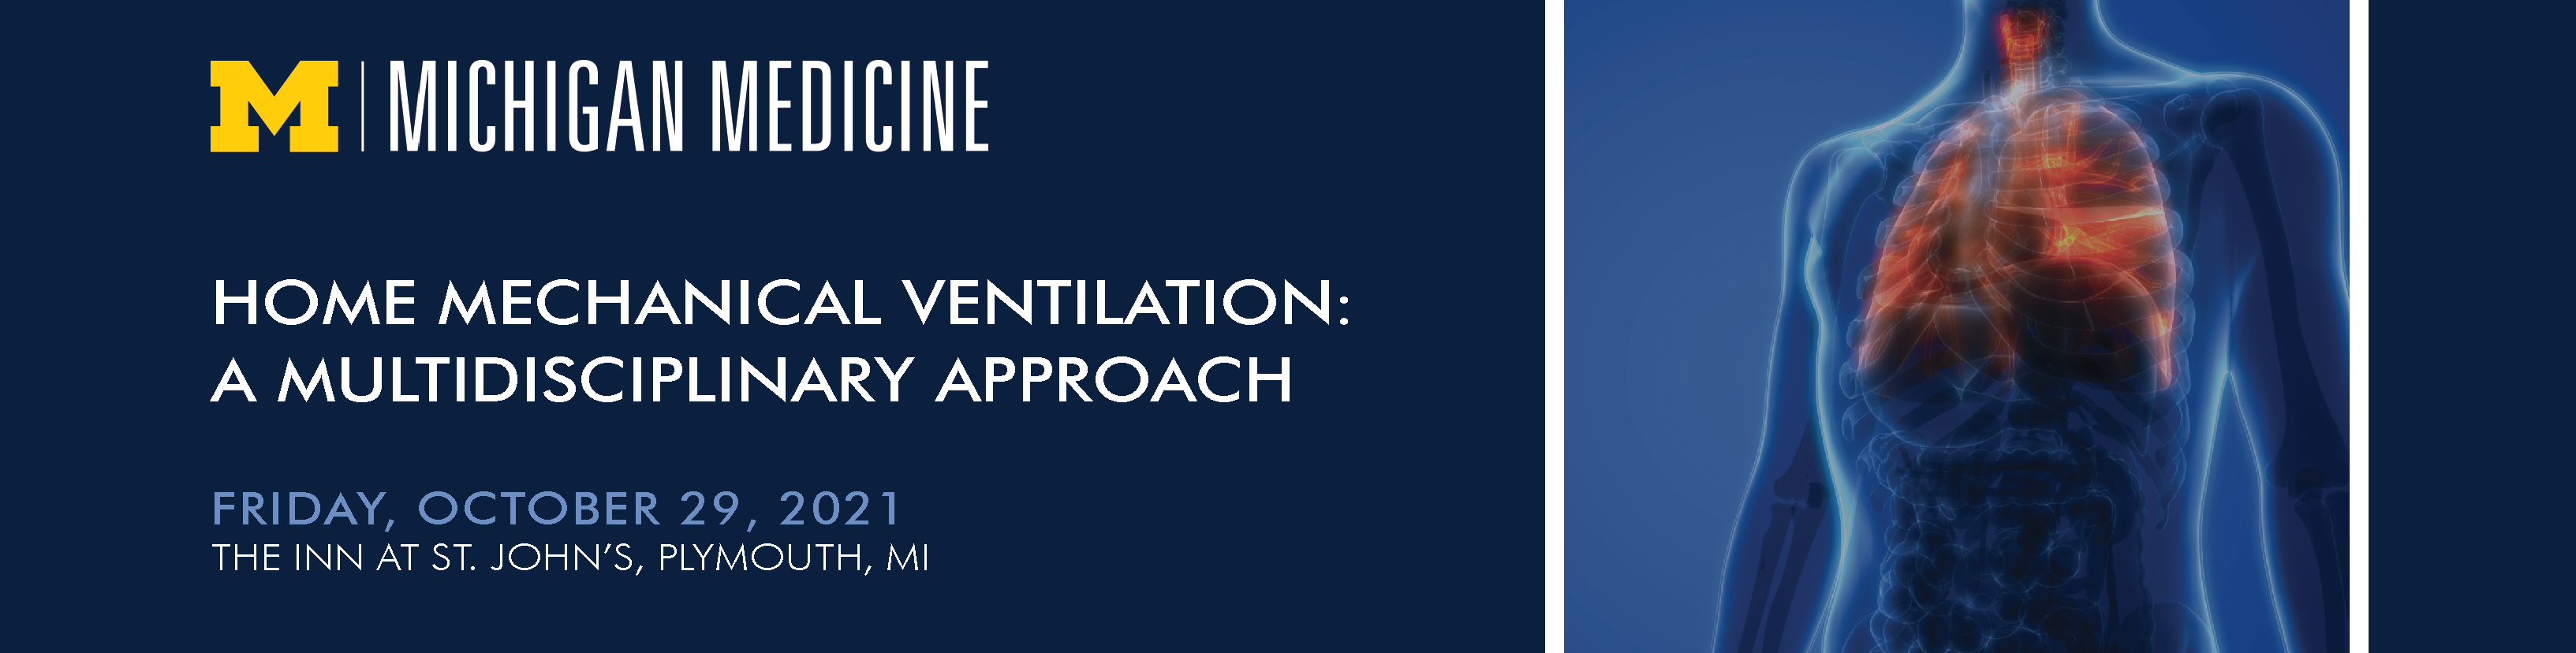 Home Mechanical Ventilation: A Multidisciplinary Approach